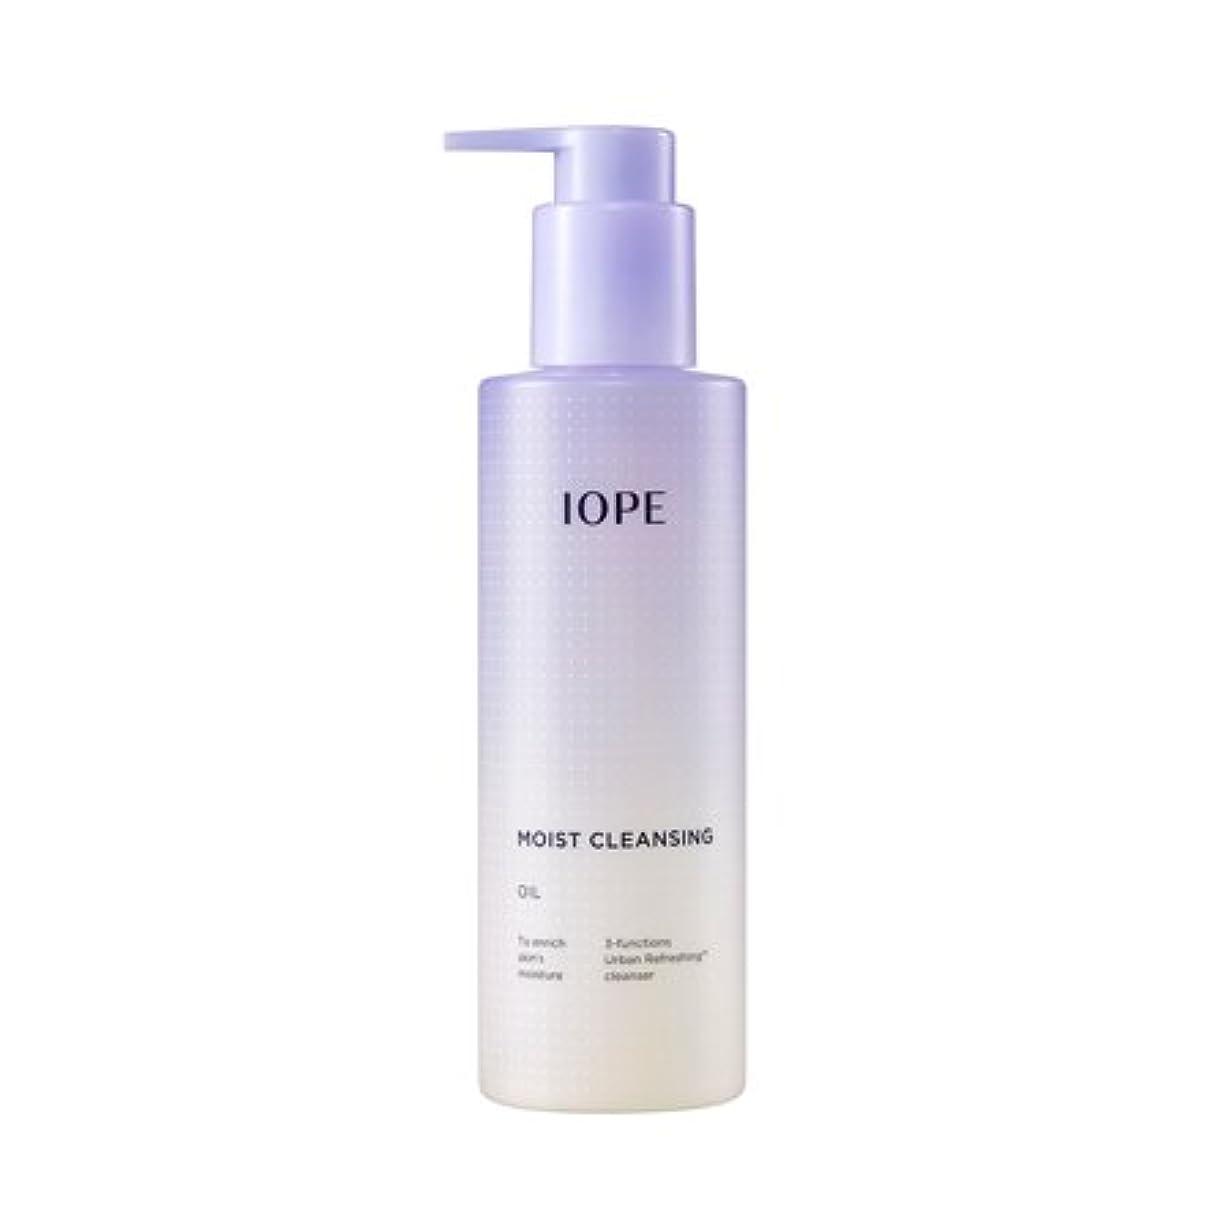 IOPE Moist Cleansing Oil/アイオペ モイストクレンジングオイル 200ml [並行輸入品]